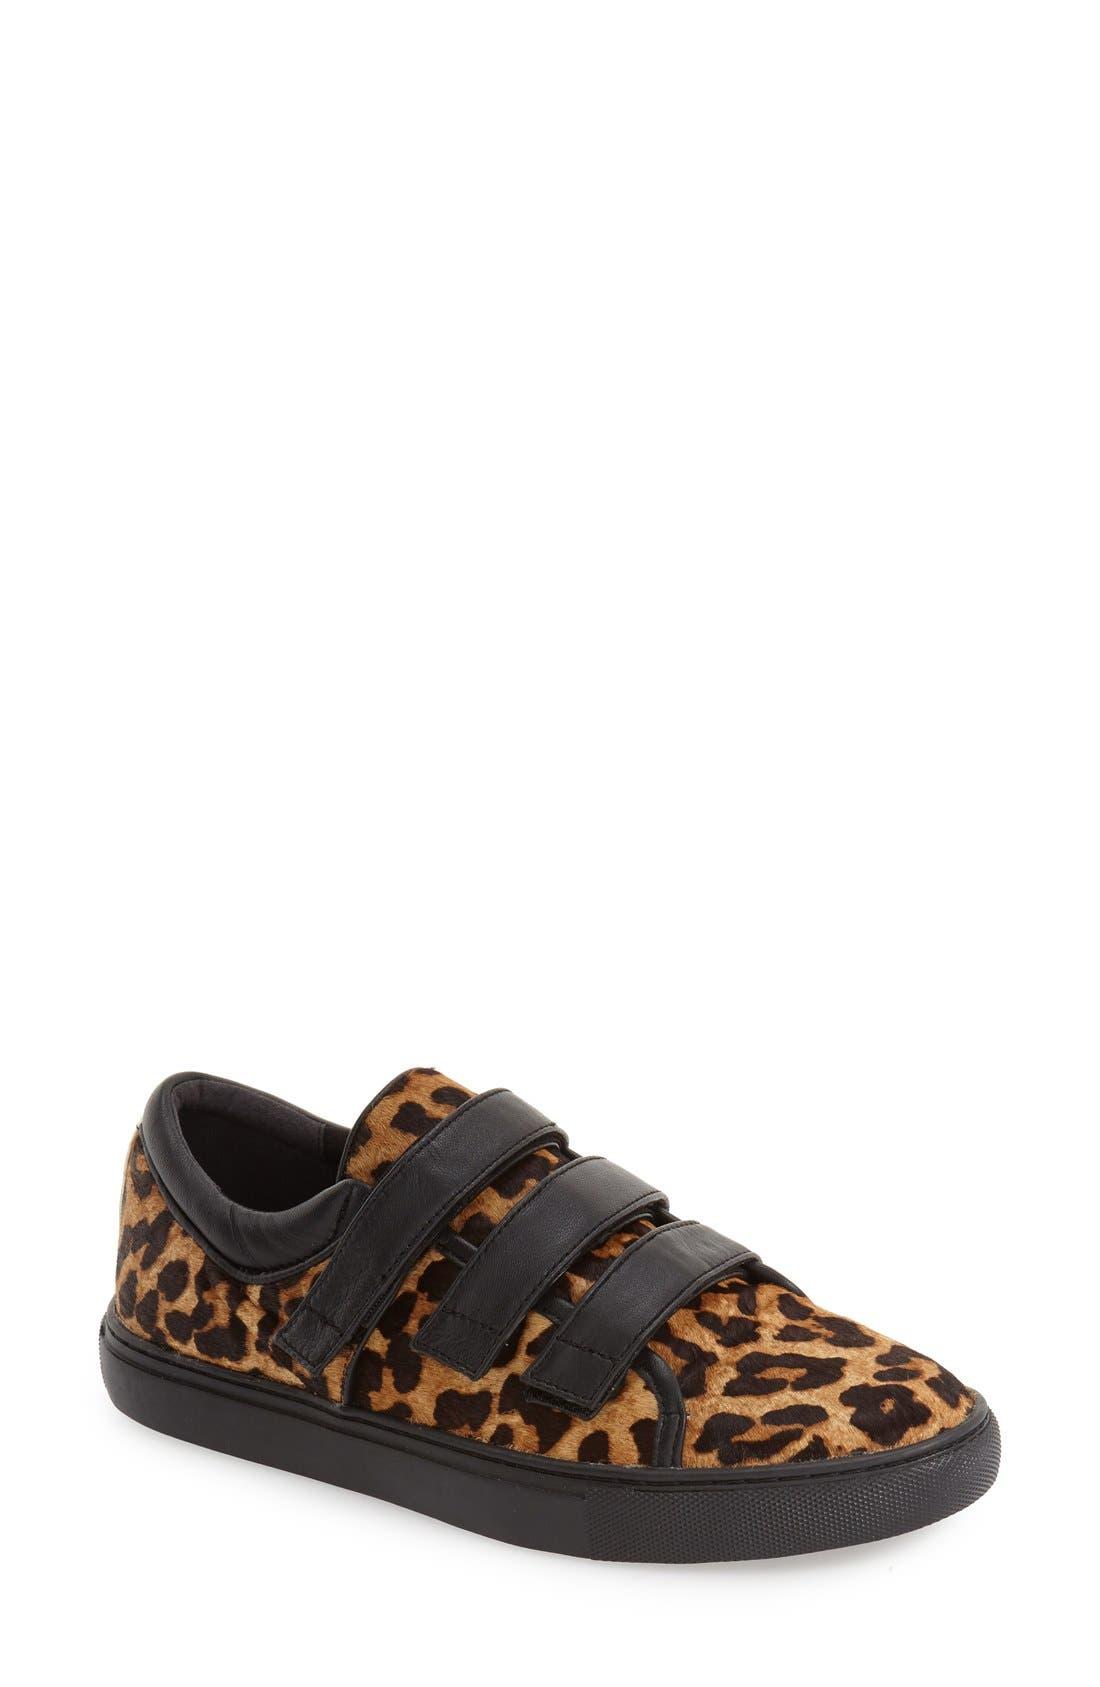 Kenneth Cole New York 'Kingviel' Genuine Calf Hair Sneaker (Women)